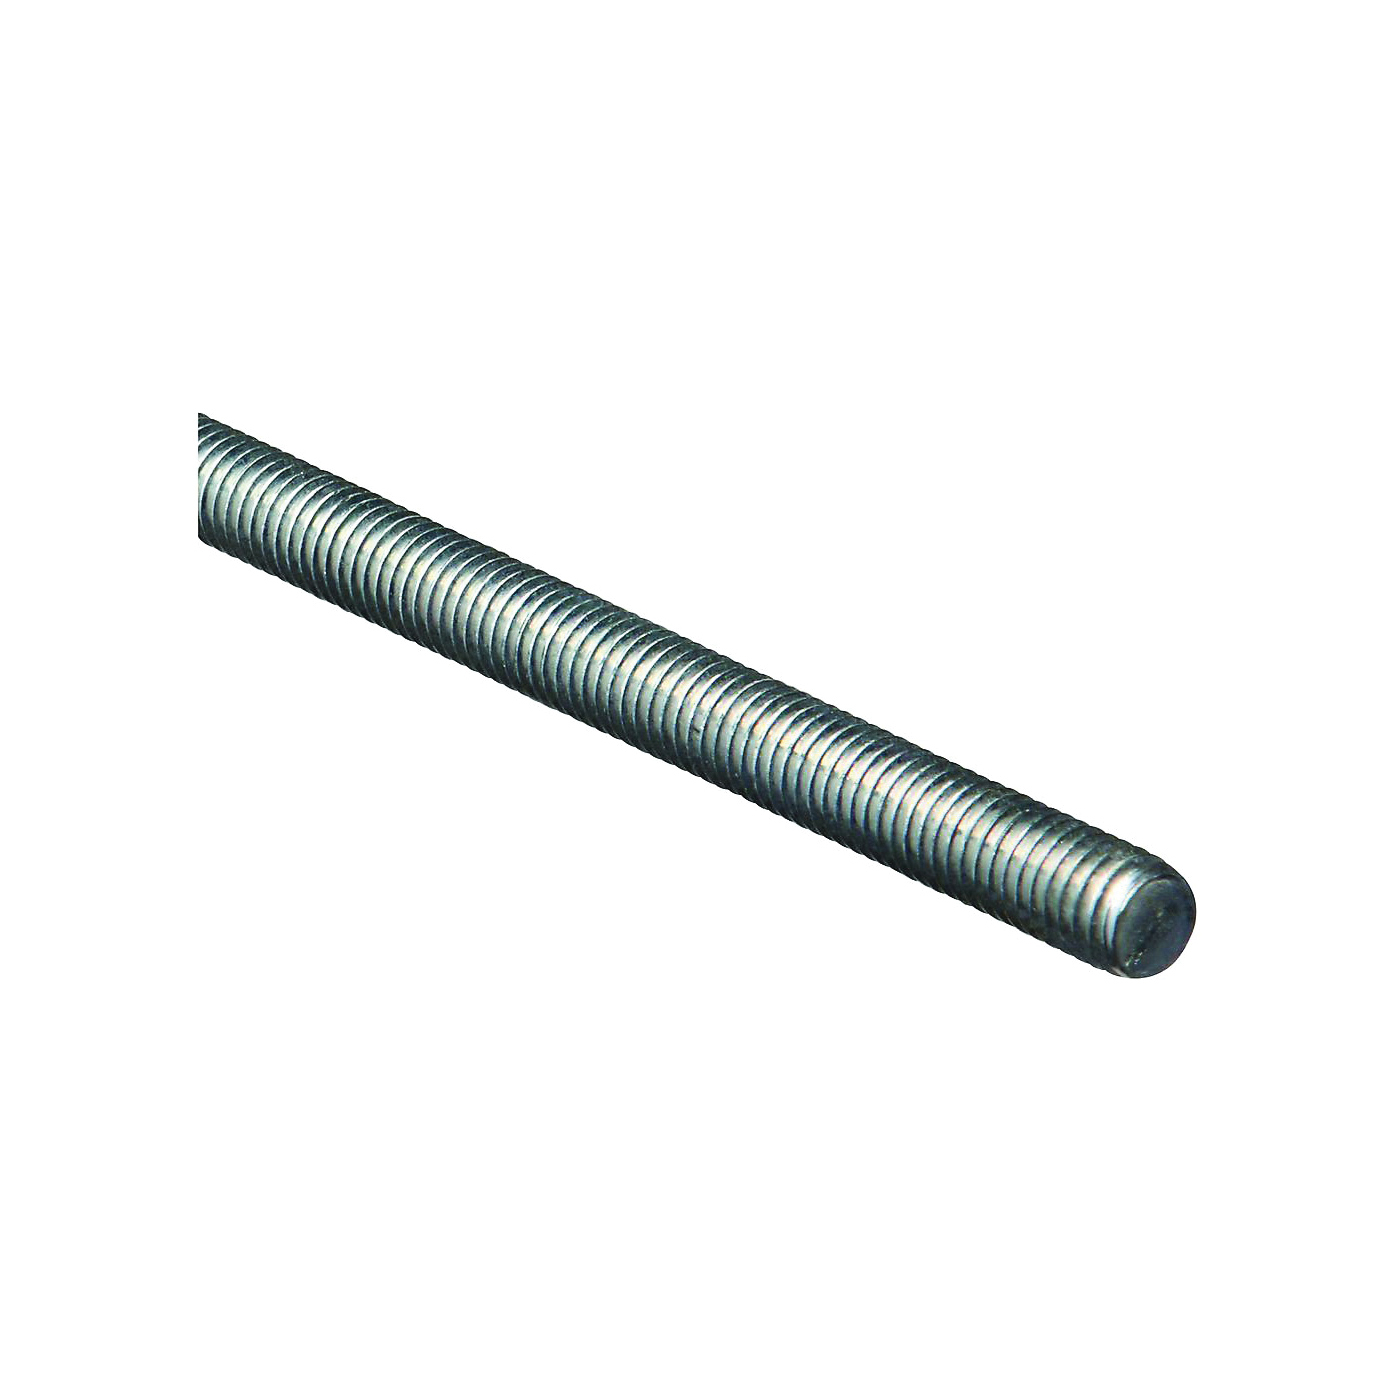 Picture of Stanley Hardware 179523 Threaded Rod, 7/16-14 Thread, 36 in L, A Grade, Steel, Zinc, UNC Thread